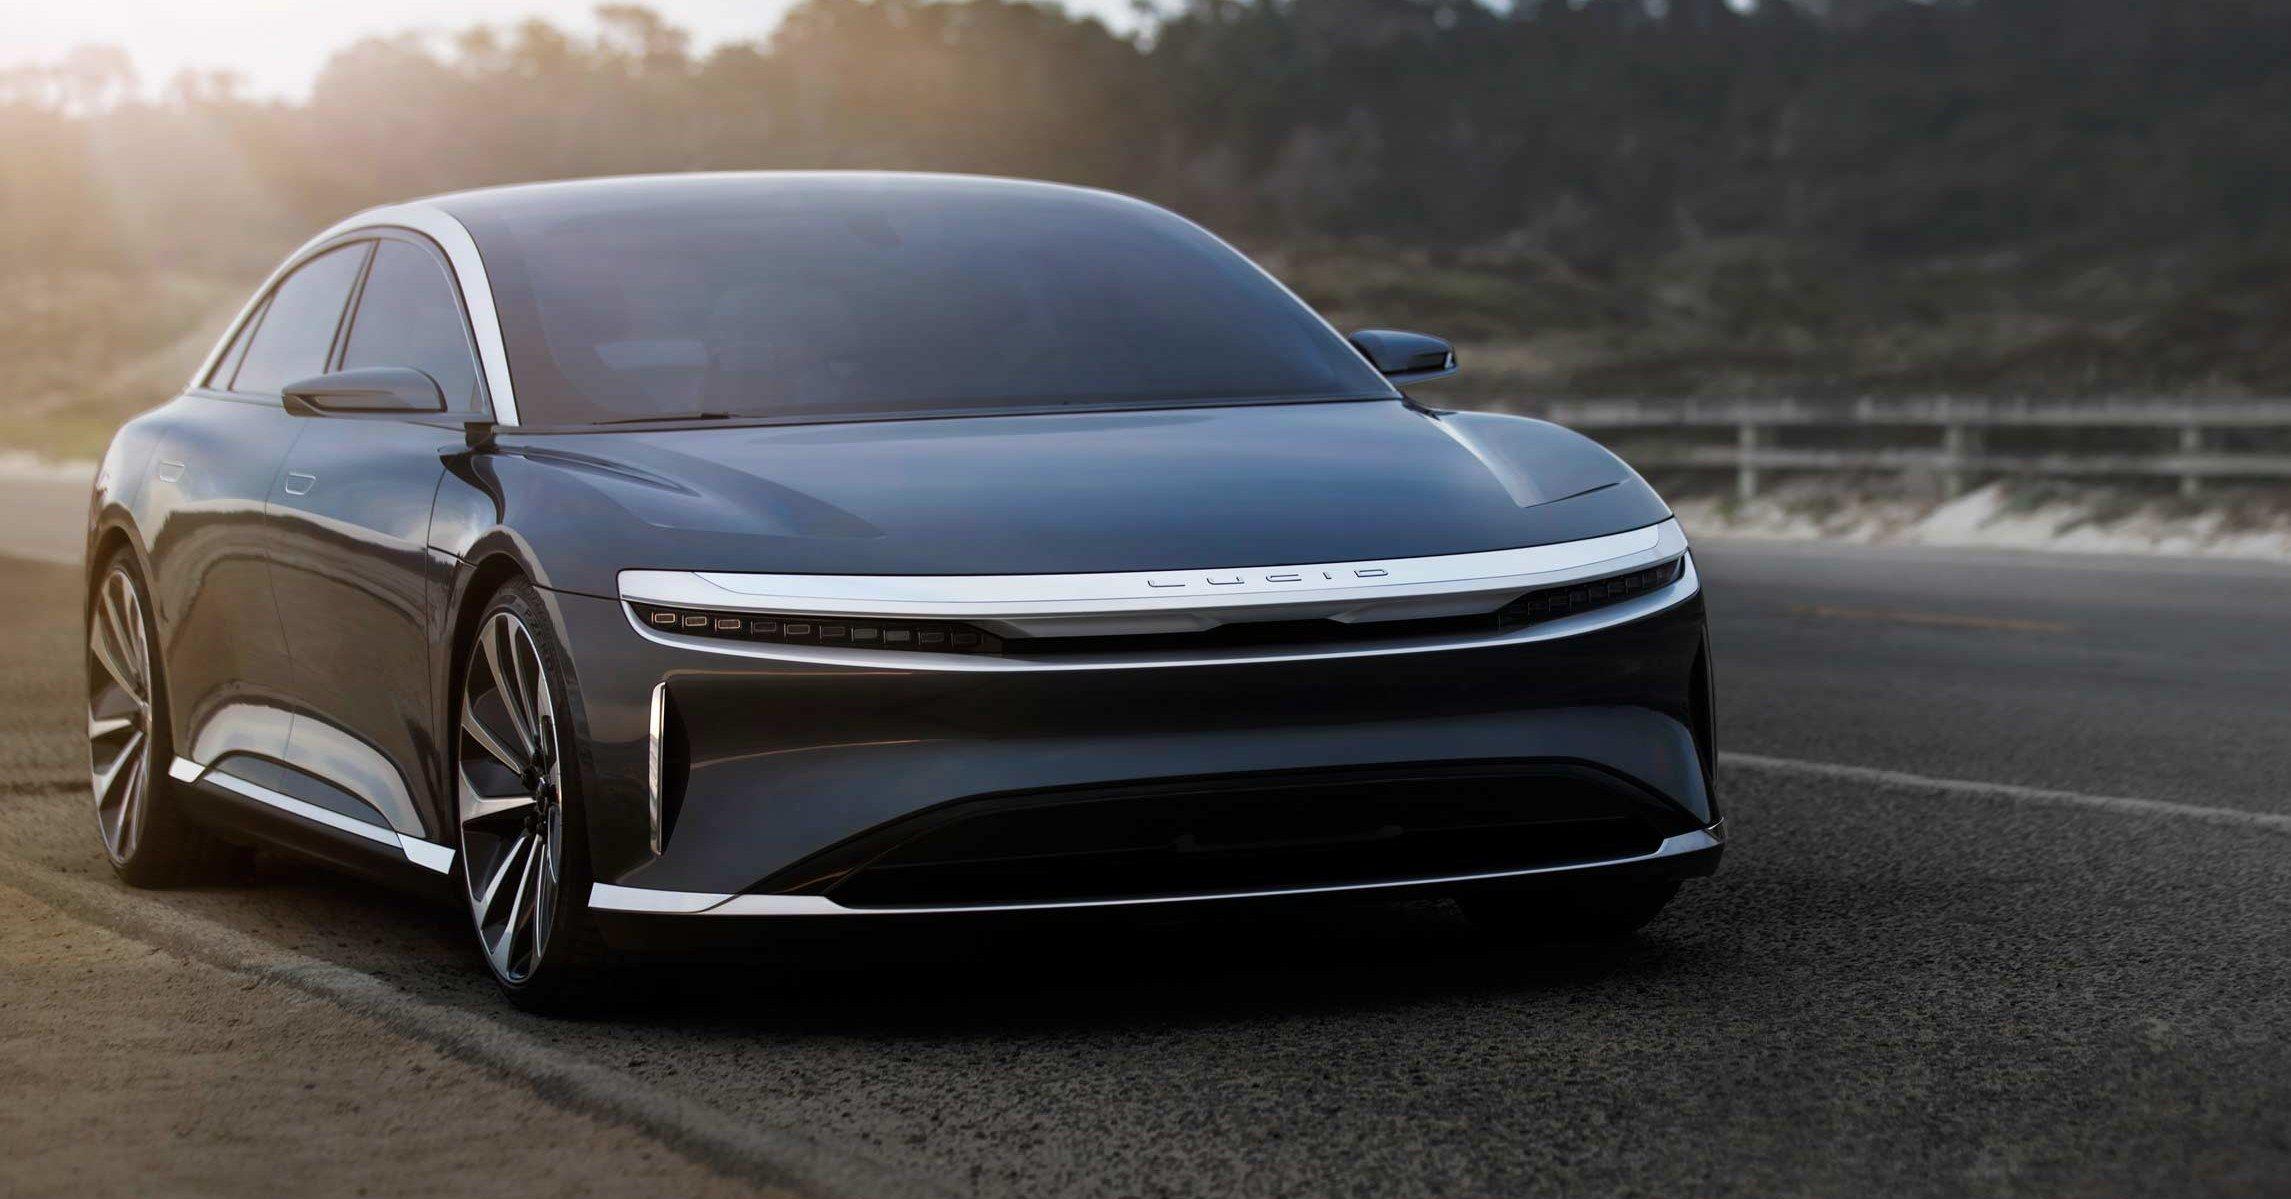 This Week S Car News General Motors Self Driving Car A New Infiniti And More Electric Cars Tesla Model Electric Car